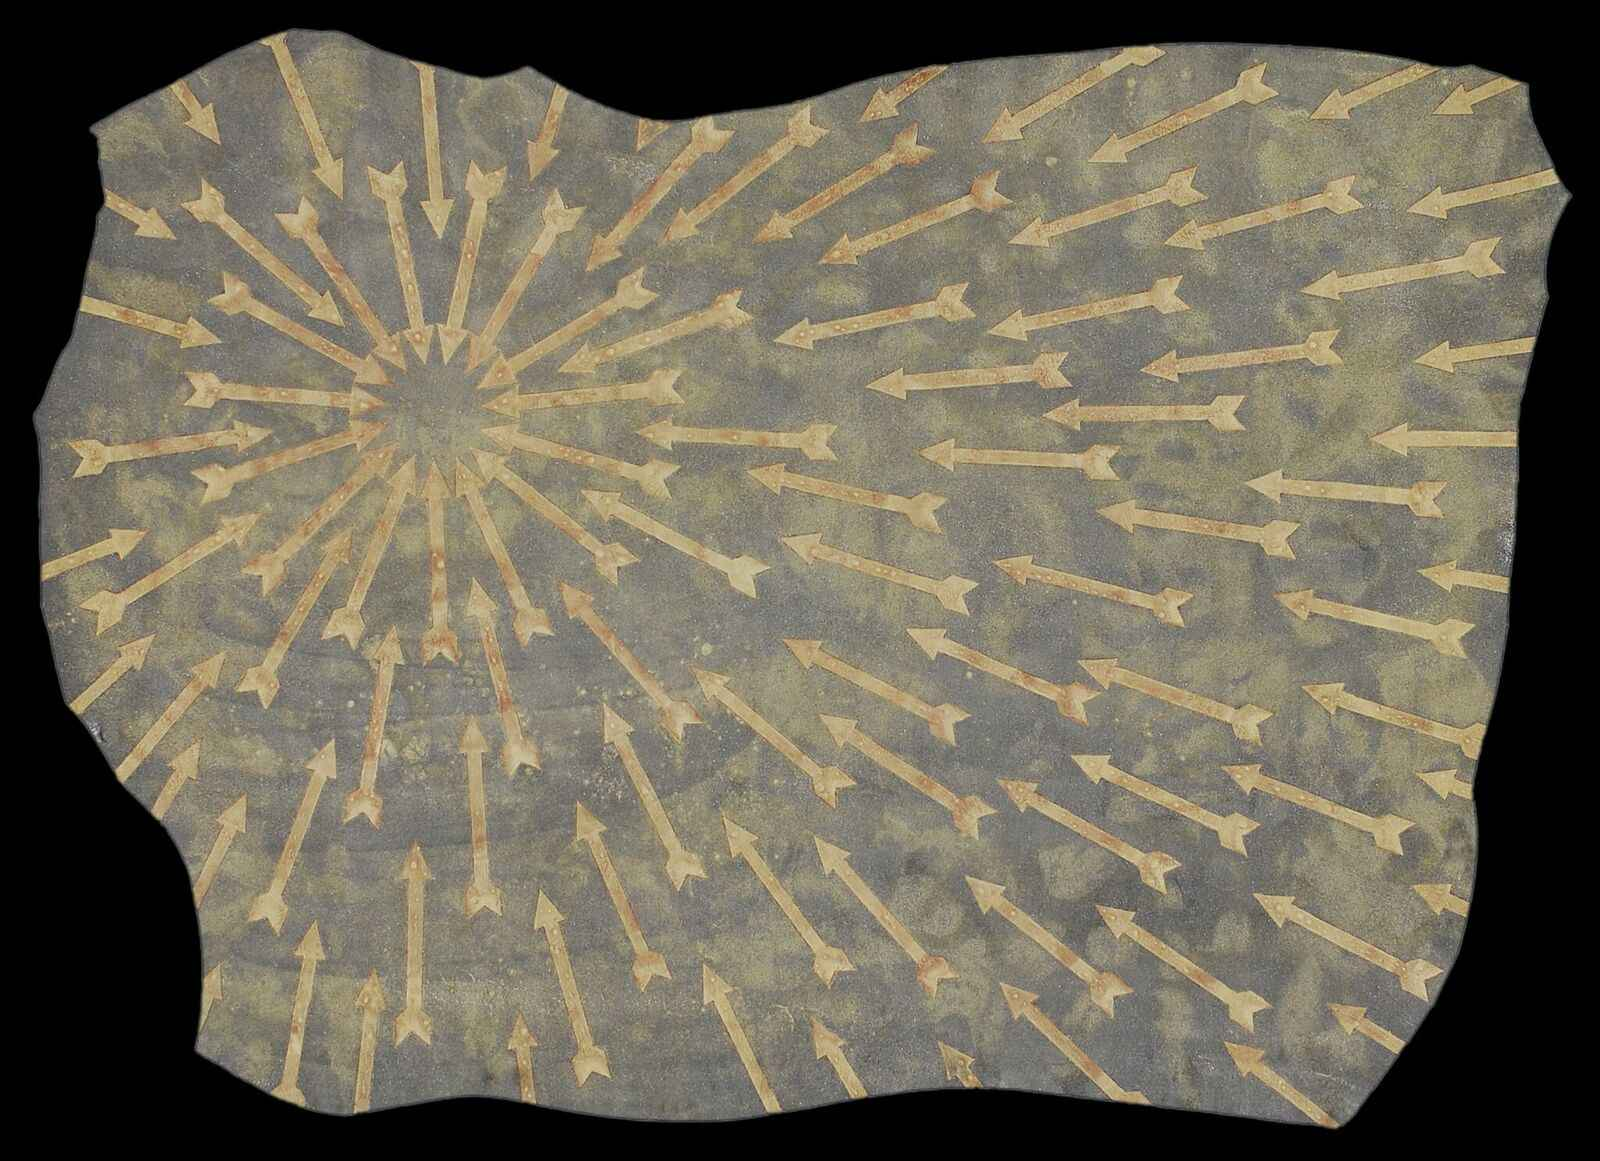 ANCIENT HISTORIES #175 by MR. DAVID A. CLARK - Masterpiece Online